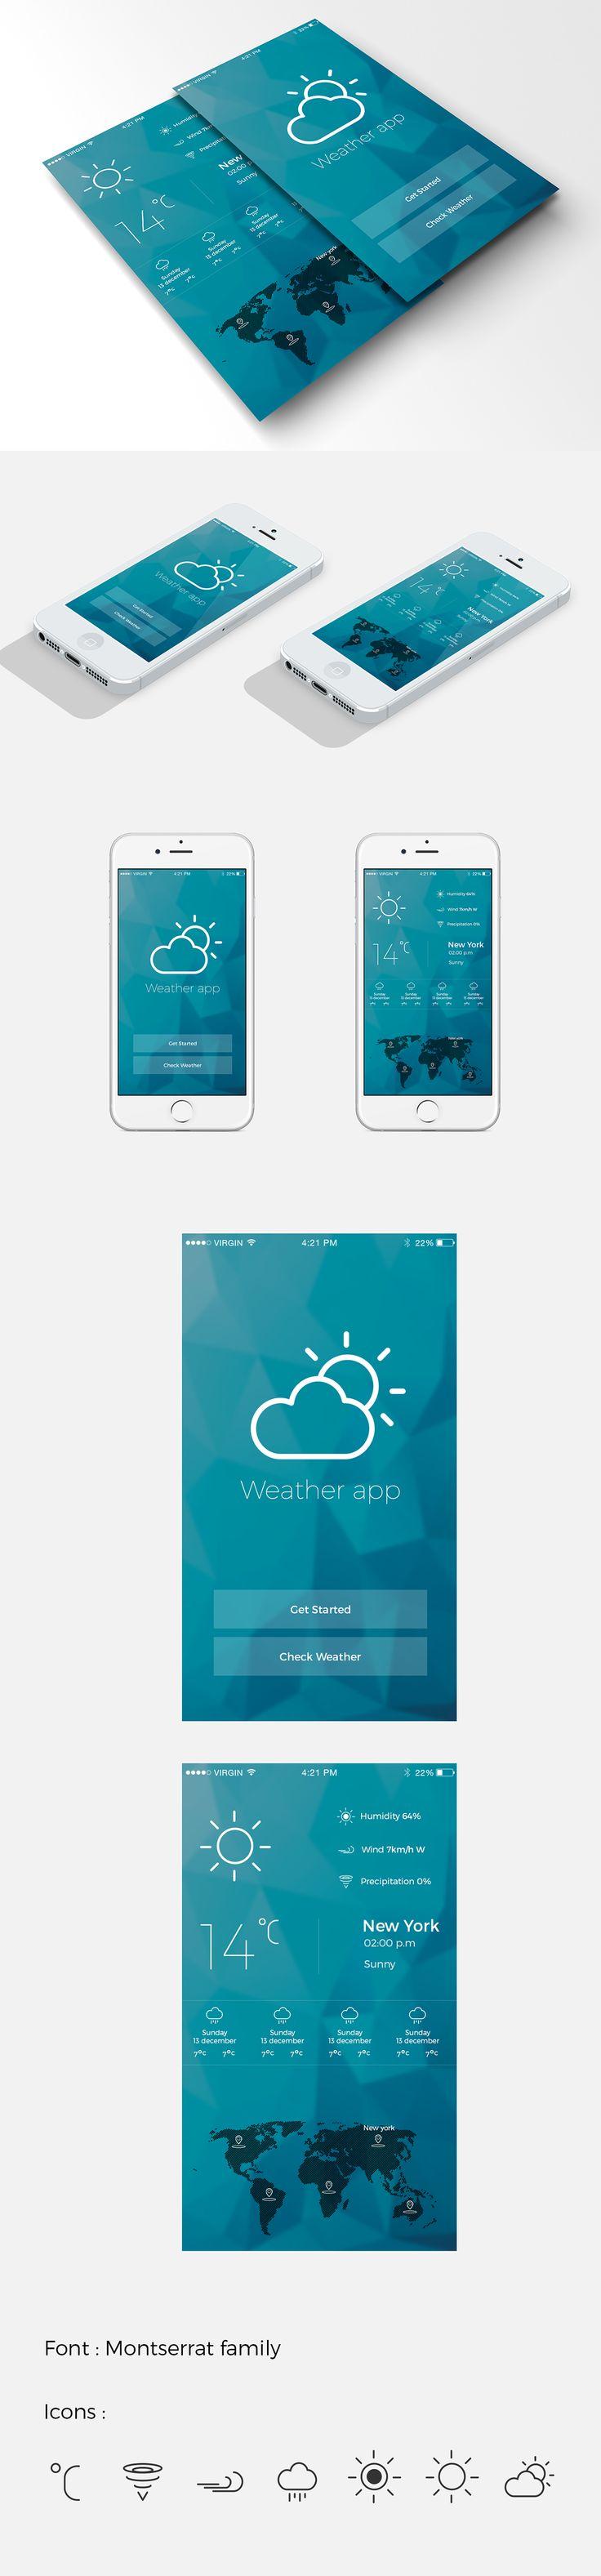 mobile/IOS weather app design on Behance